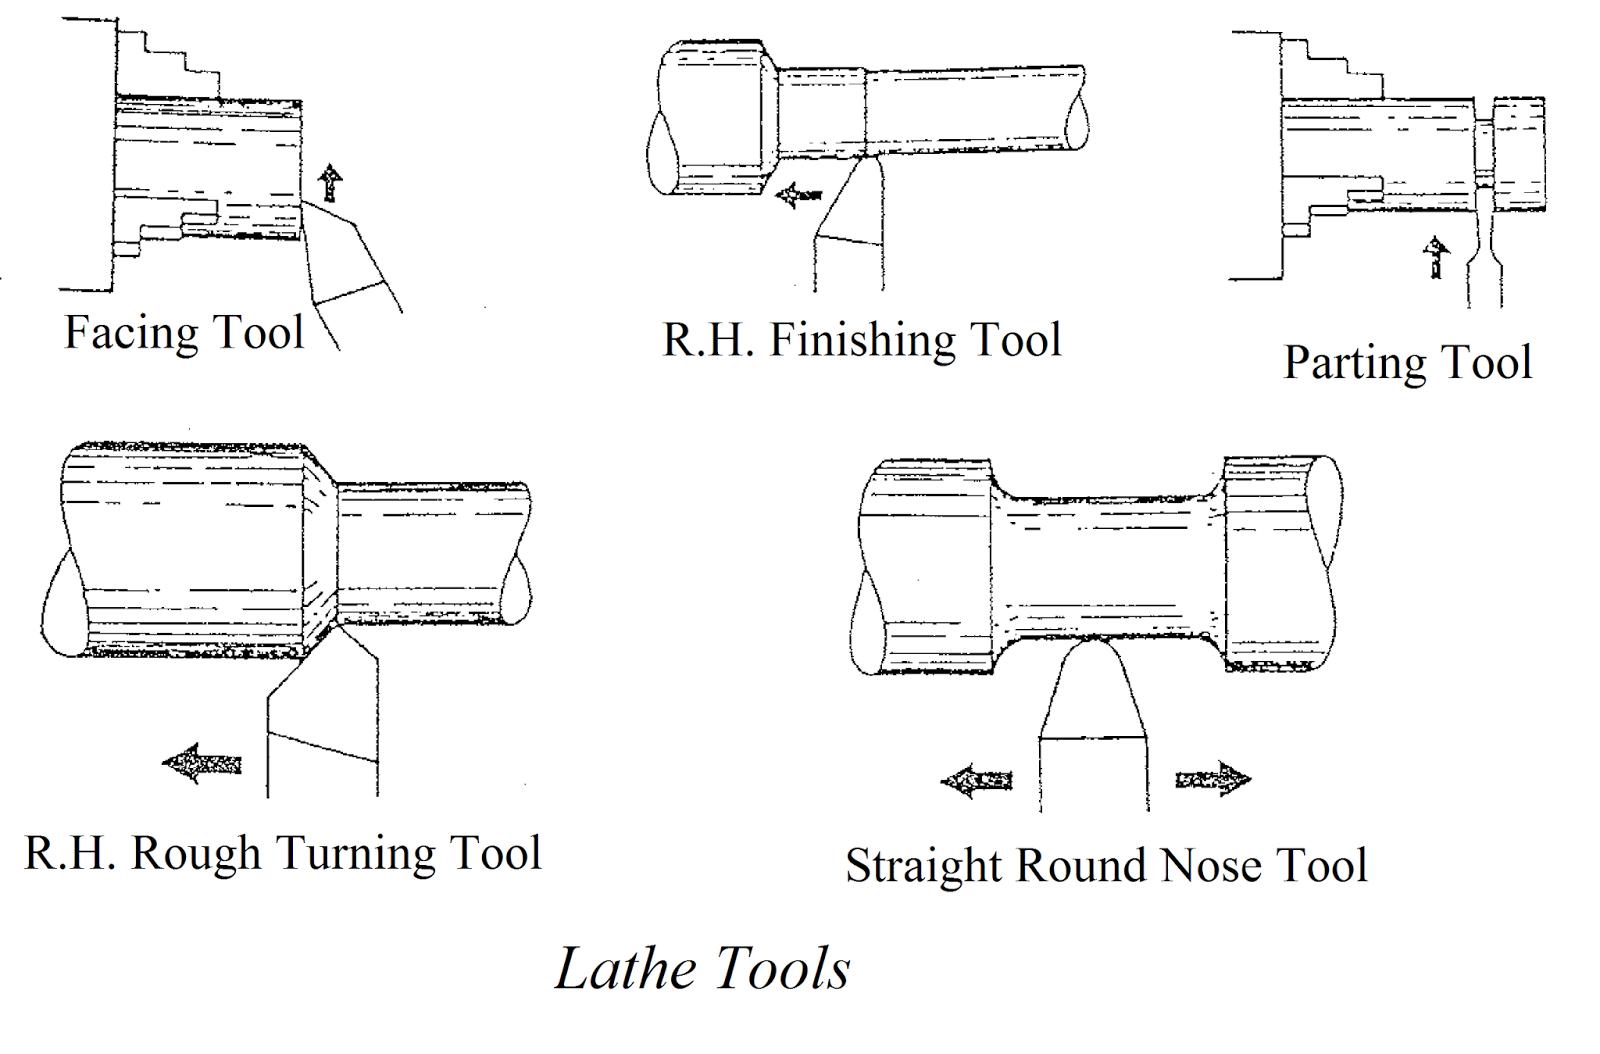 Engine Lathe Machine Vintage Wiring Diagram Odicis Parts American Free Image